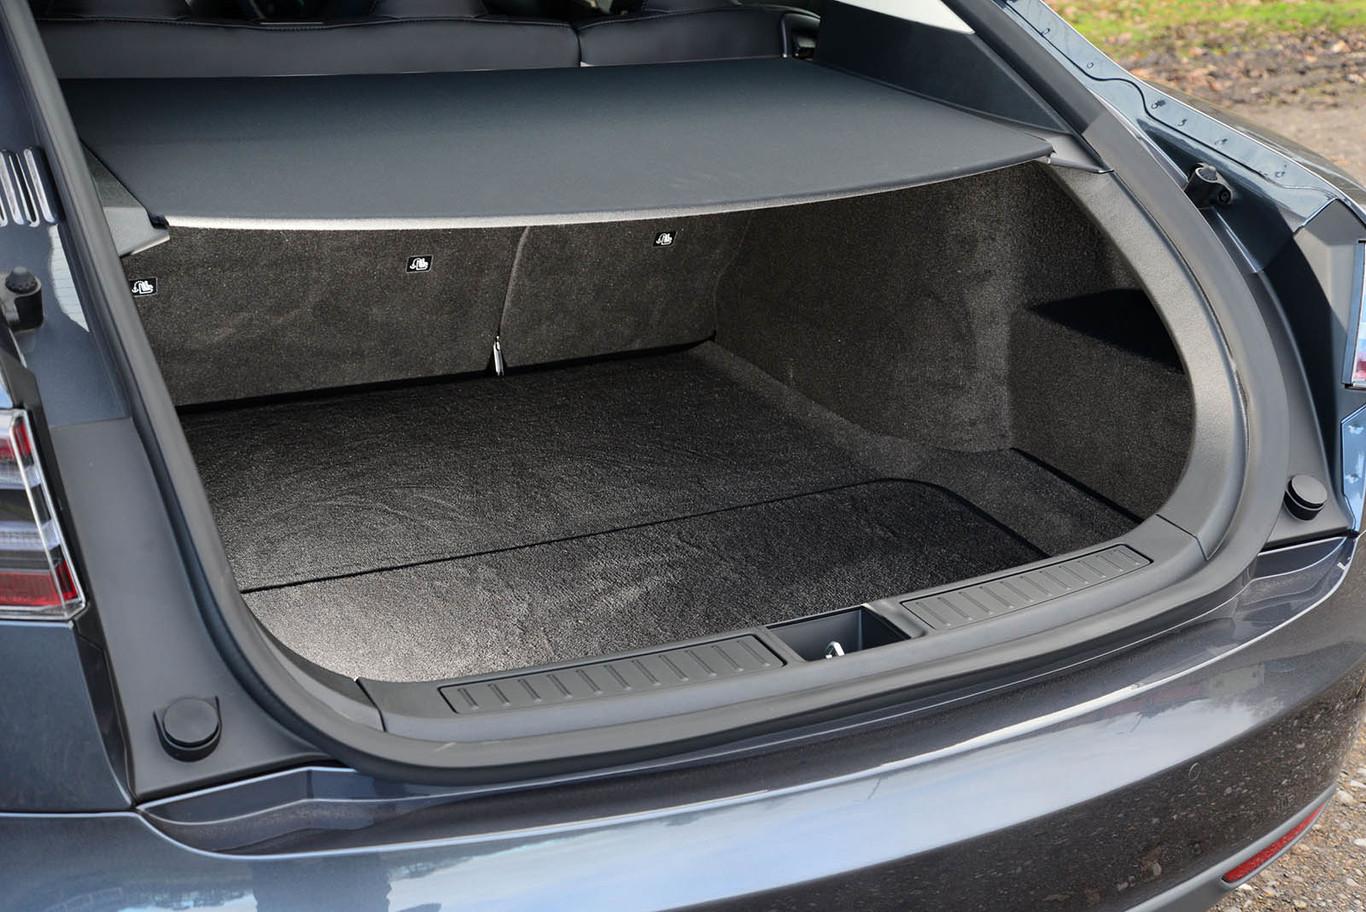 Foto de Tesla Model S 100D prueba (16/17)